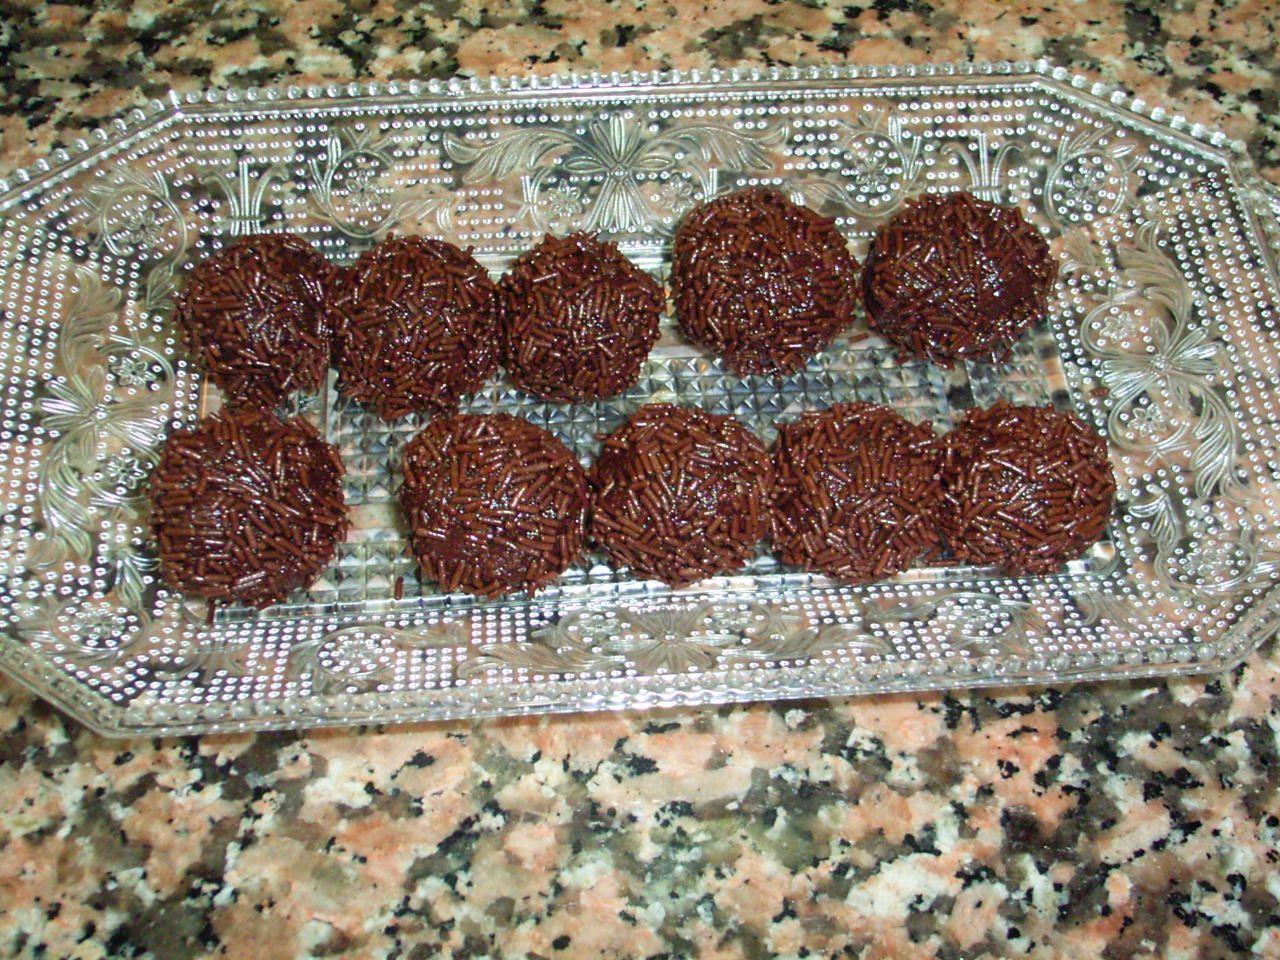 COCINA CON XENA: Trufas de chocolate con galletas